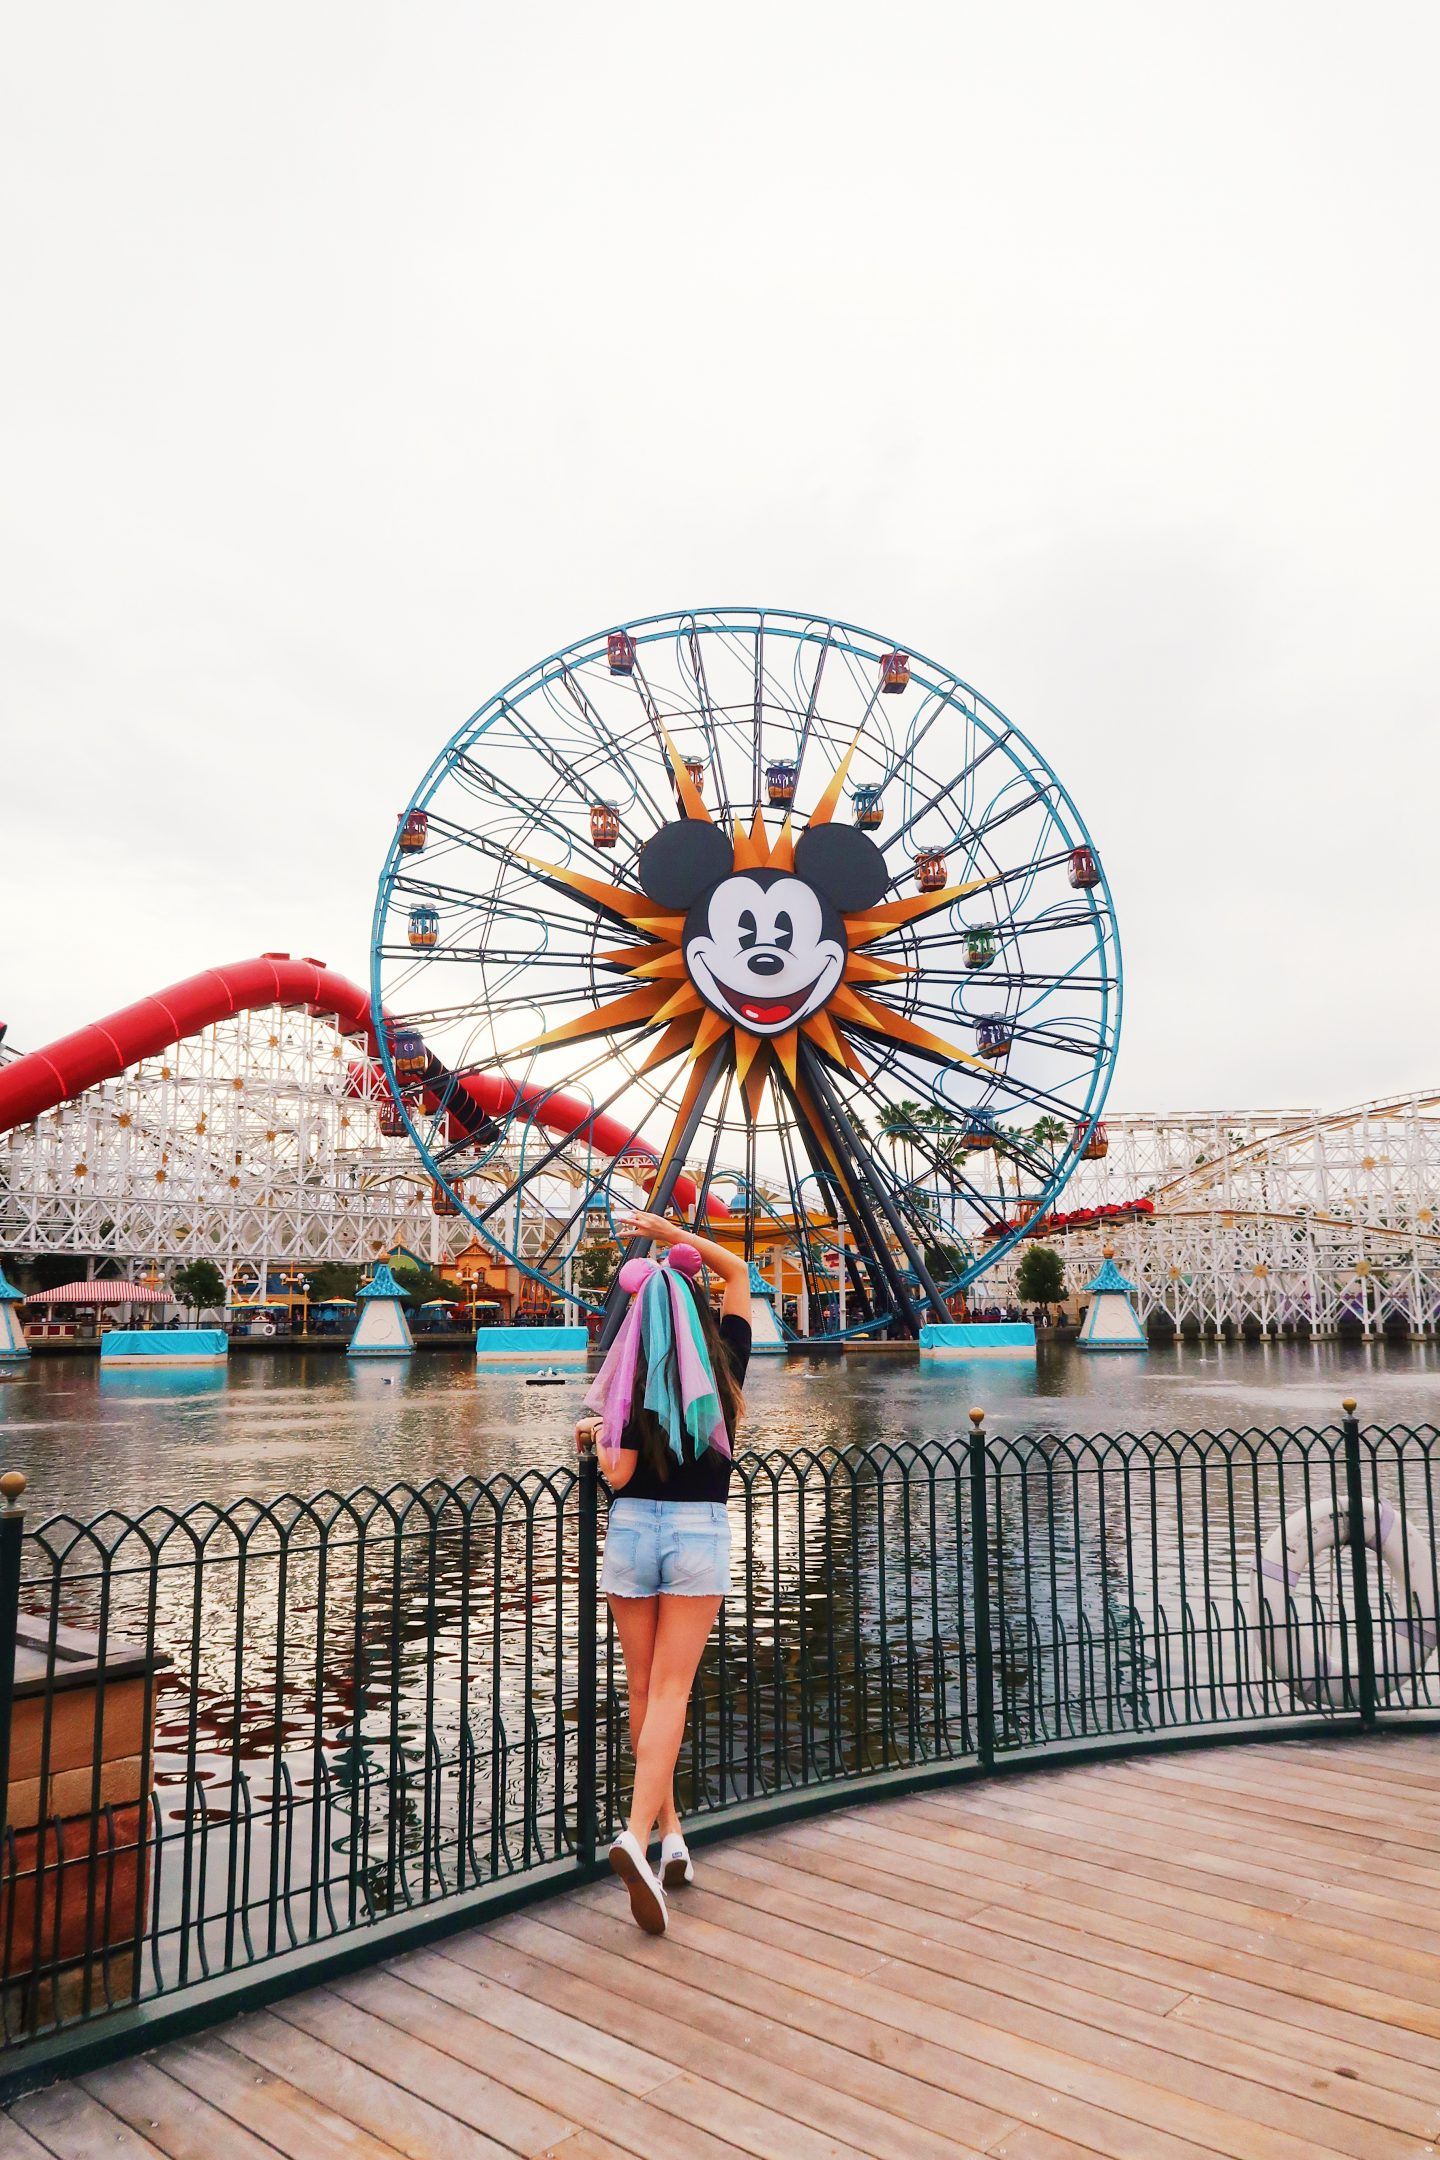 View of the Disneyland Pier in Los Angeles